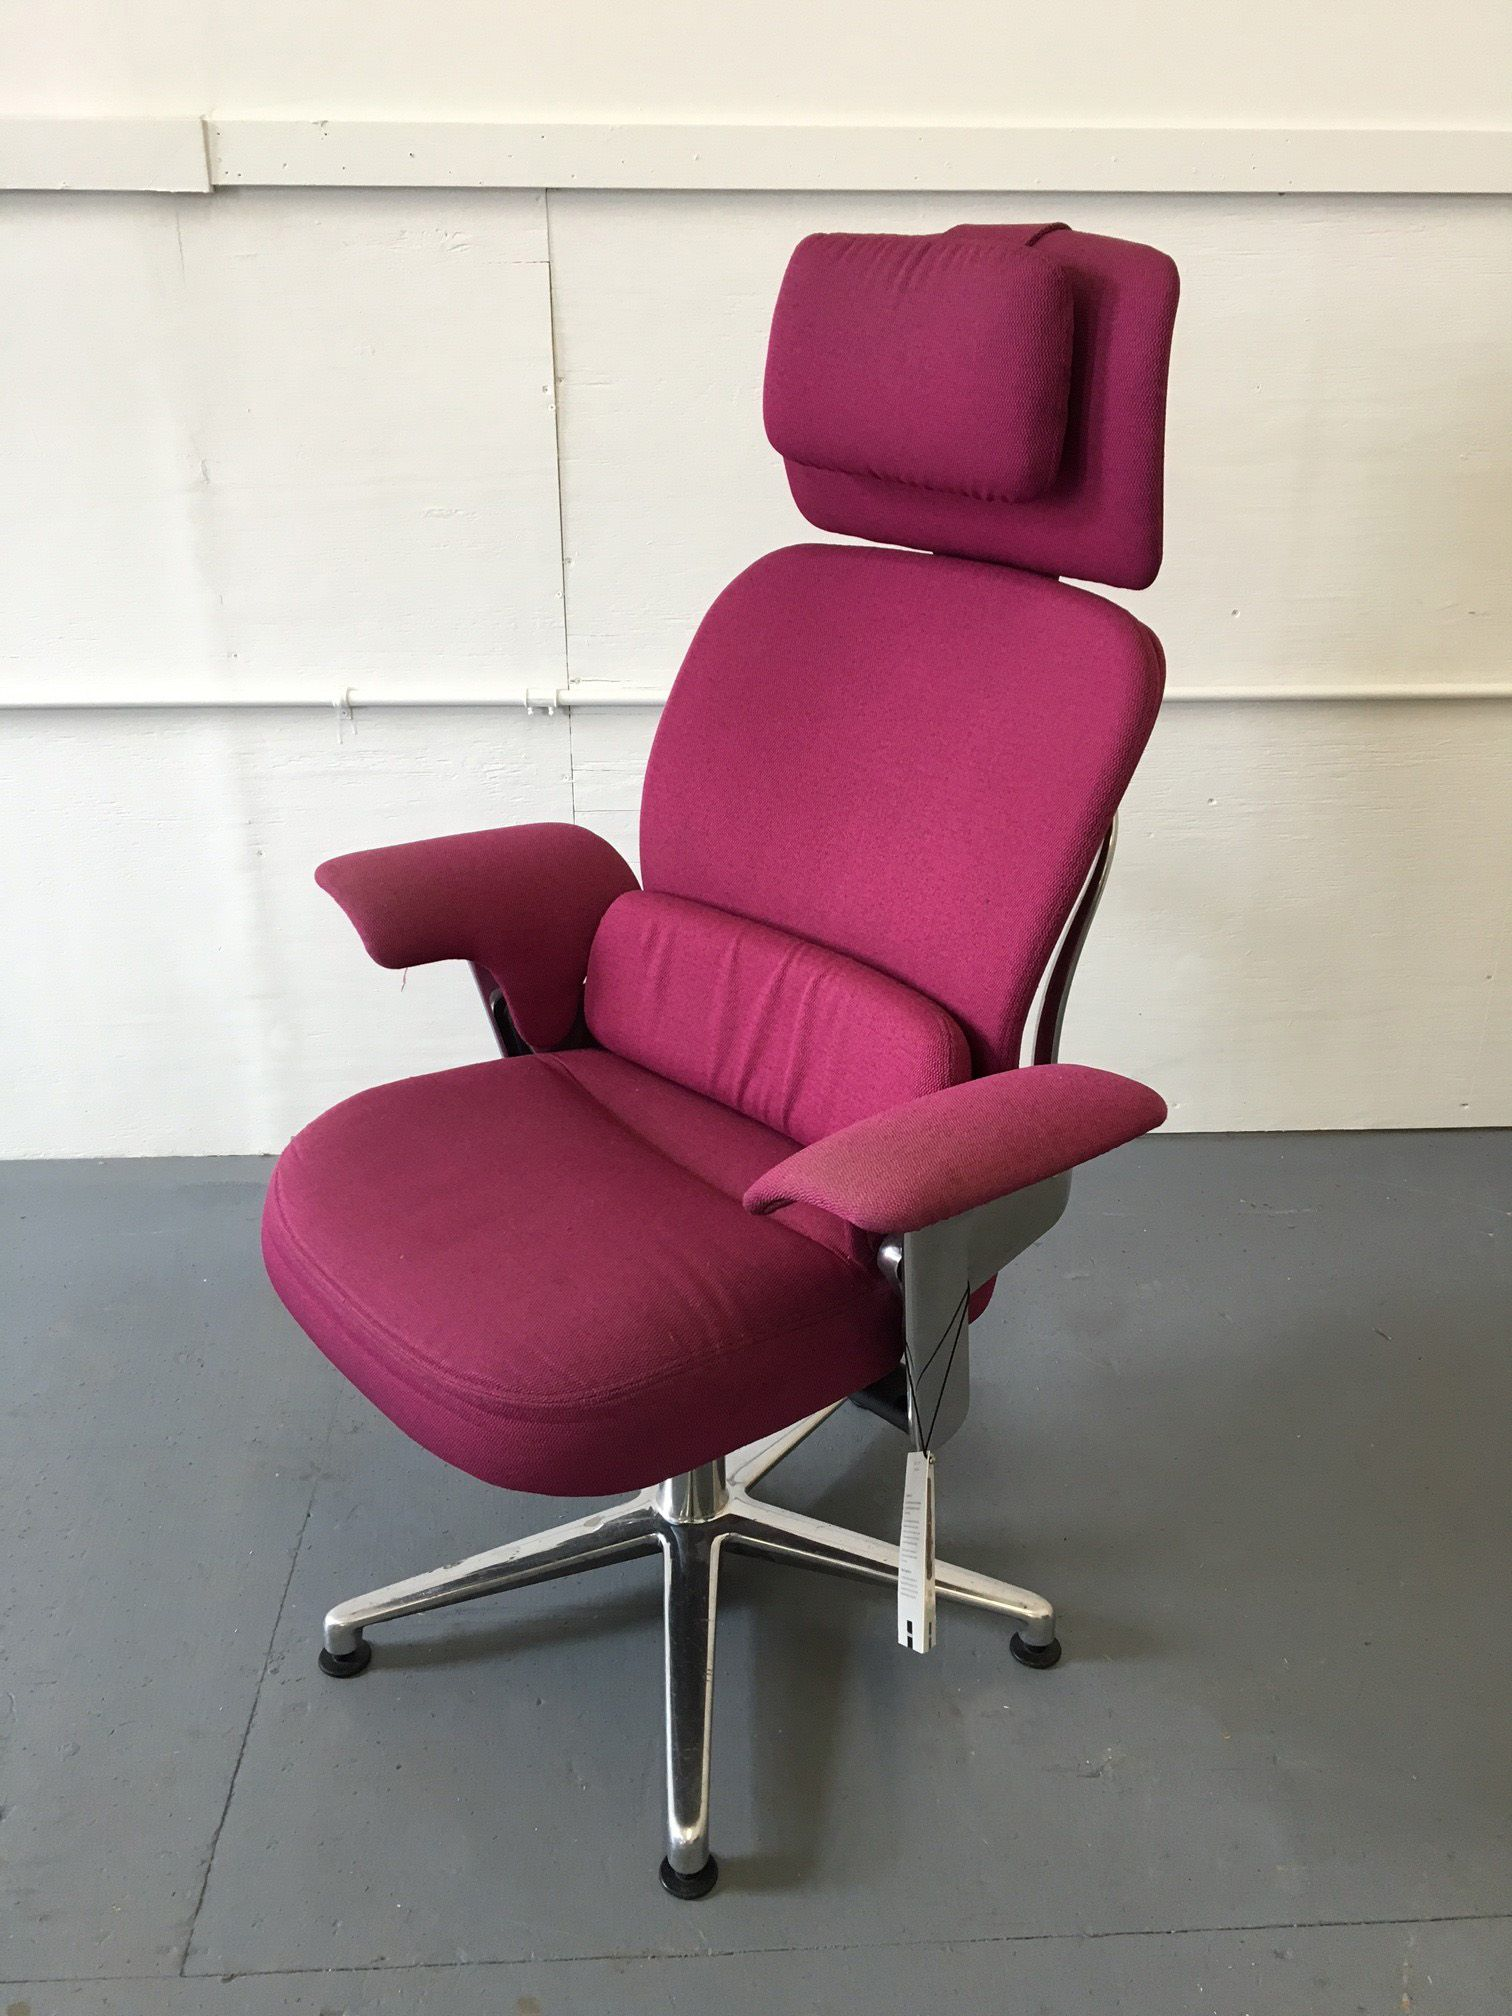 Surprising Steelcase Leap Work Lounge Conklin Pre Owned Furniture Creativecarmelina Interior Chair Design Creativecarmelinacom